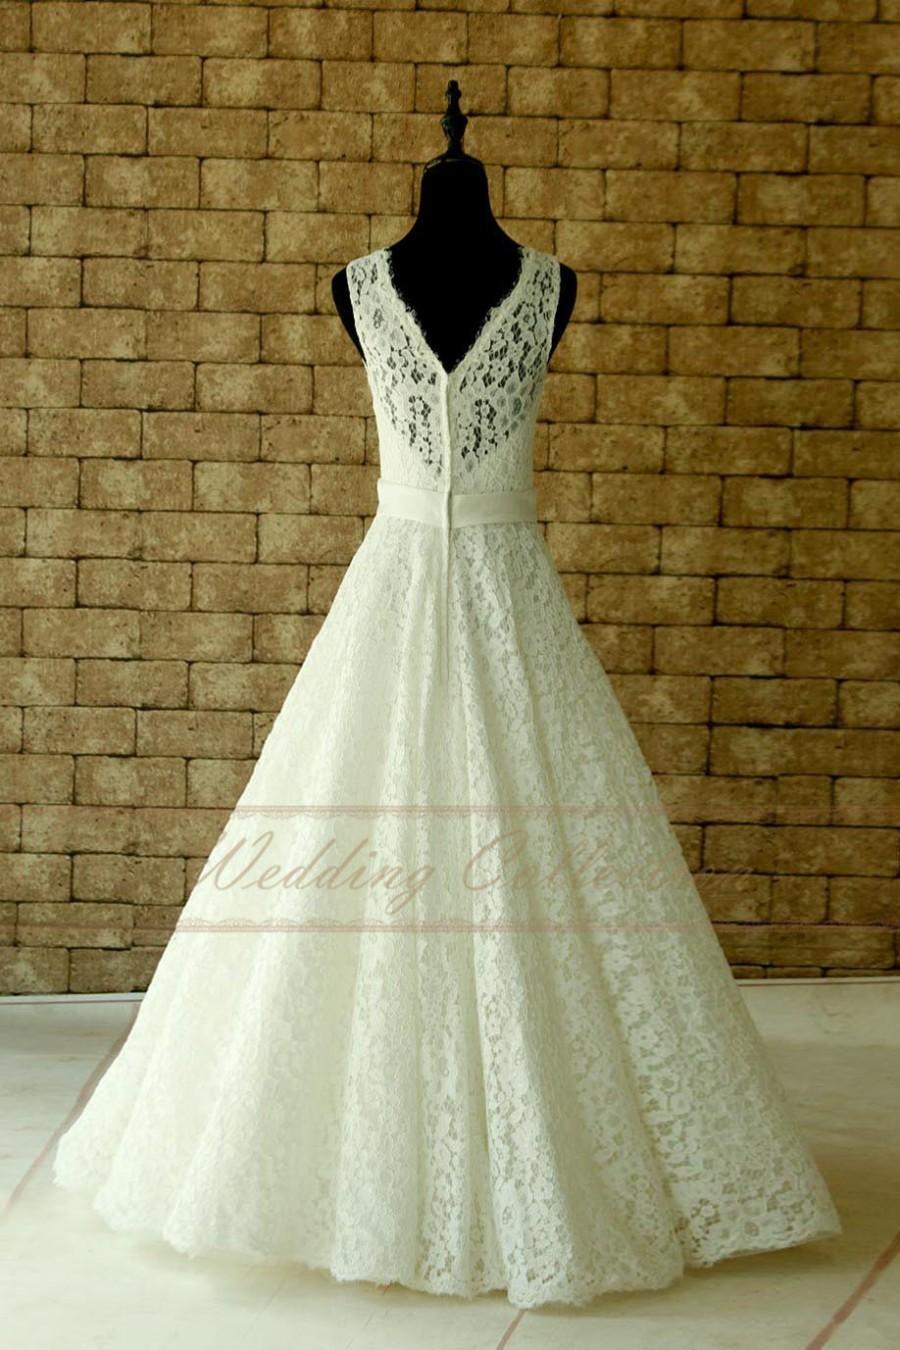 0e70e8de622 Lace Wedding Dress Sheer Neckline with Waistband Floor Length Garden Bridal  Dress